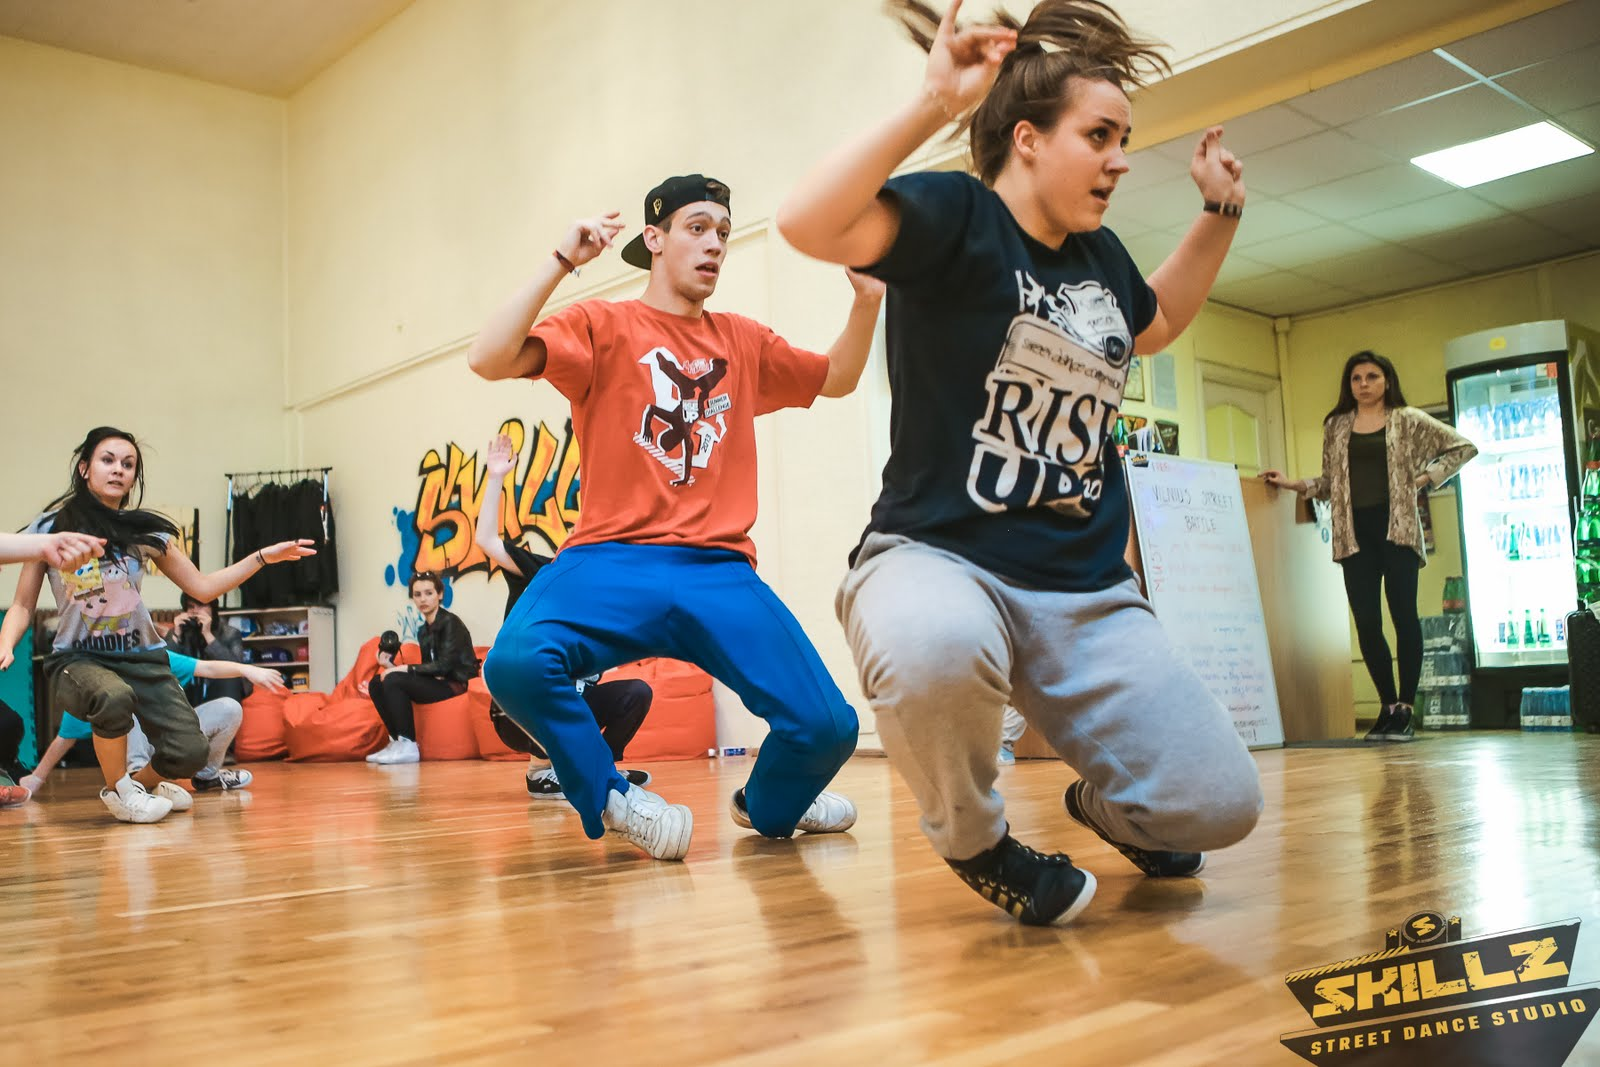 Dedson Hip Hop seminaras (FRA) - IMG_6658.jpg